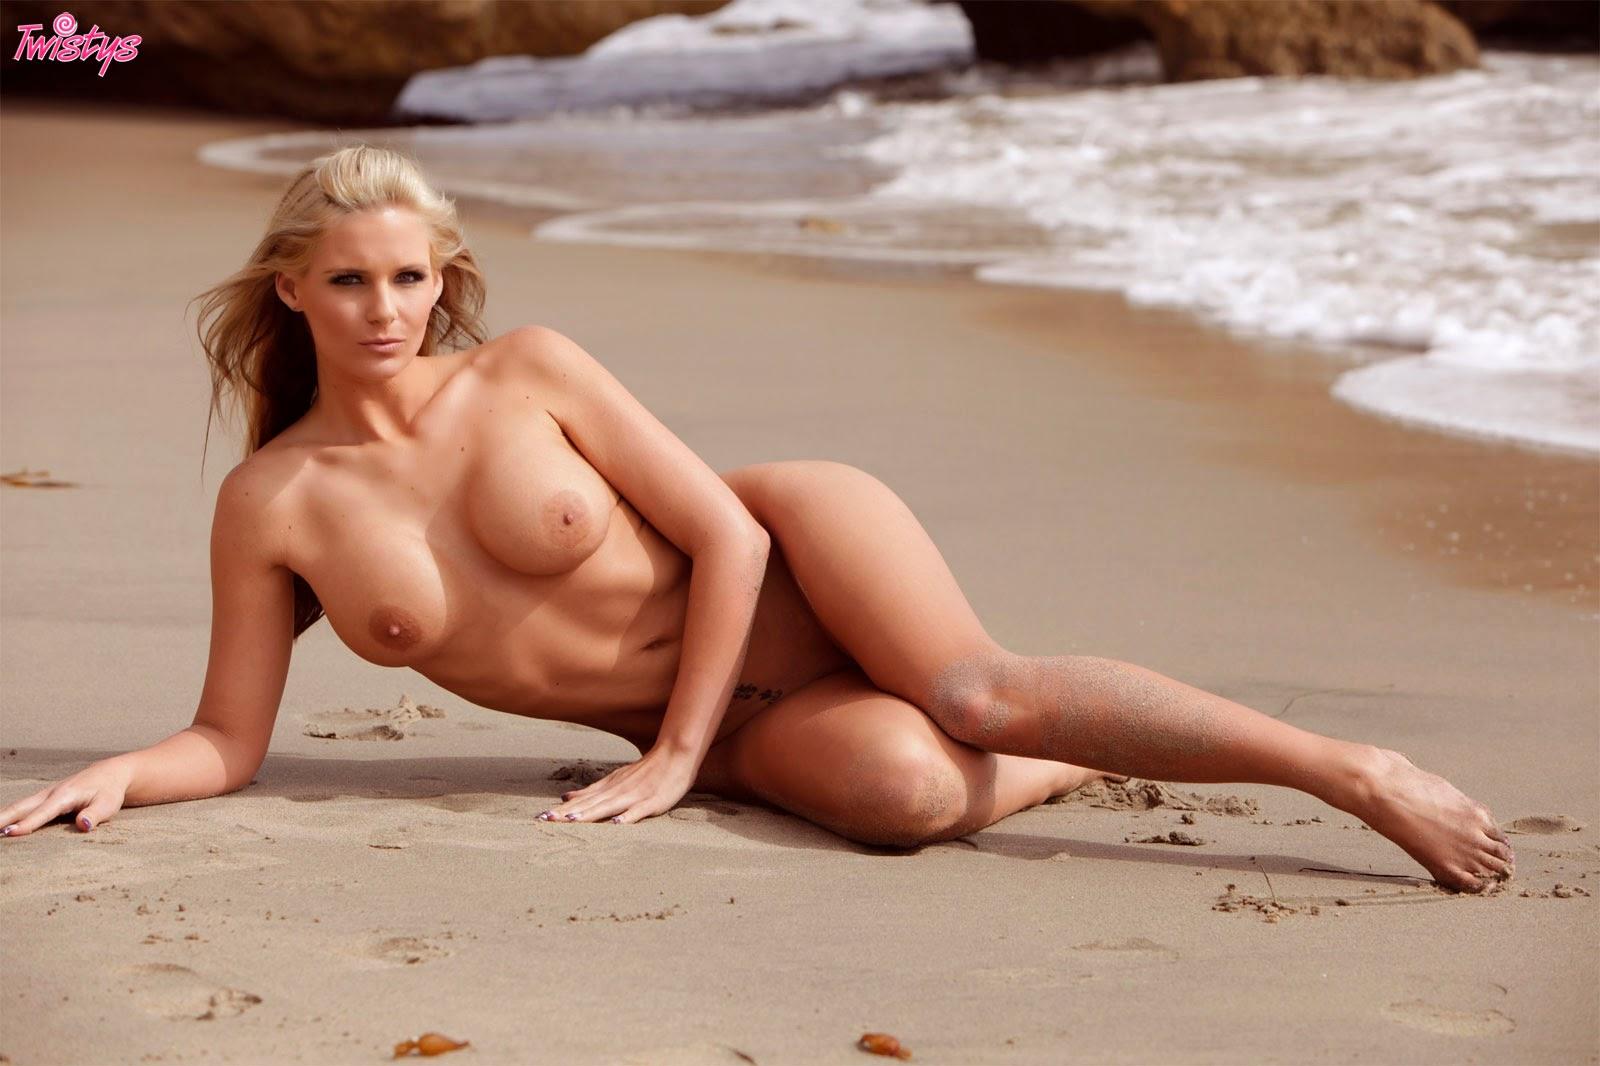 pheonix marie nude